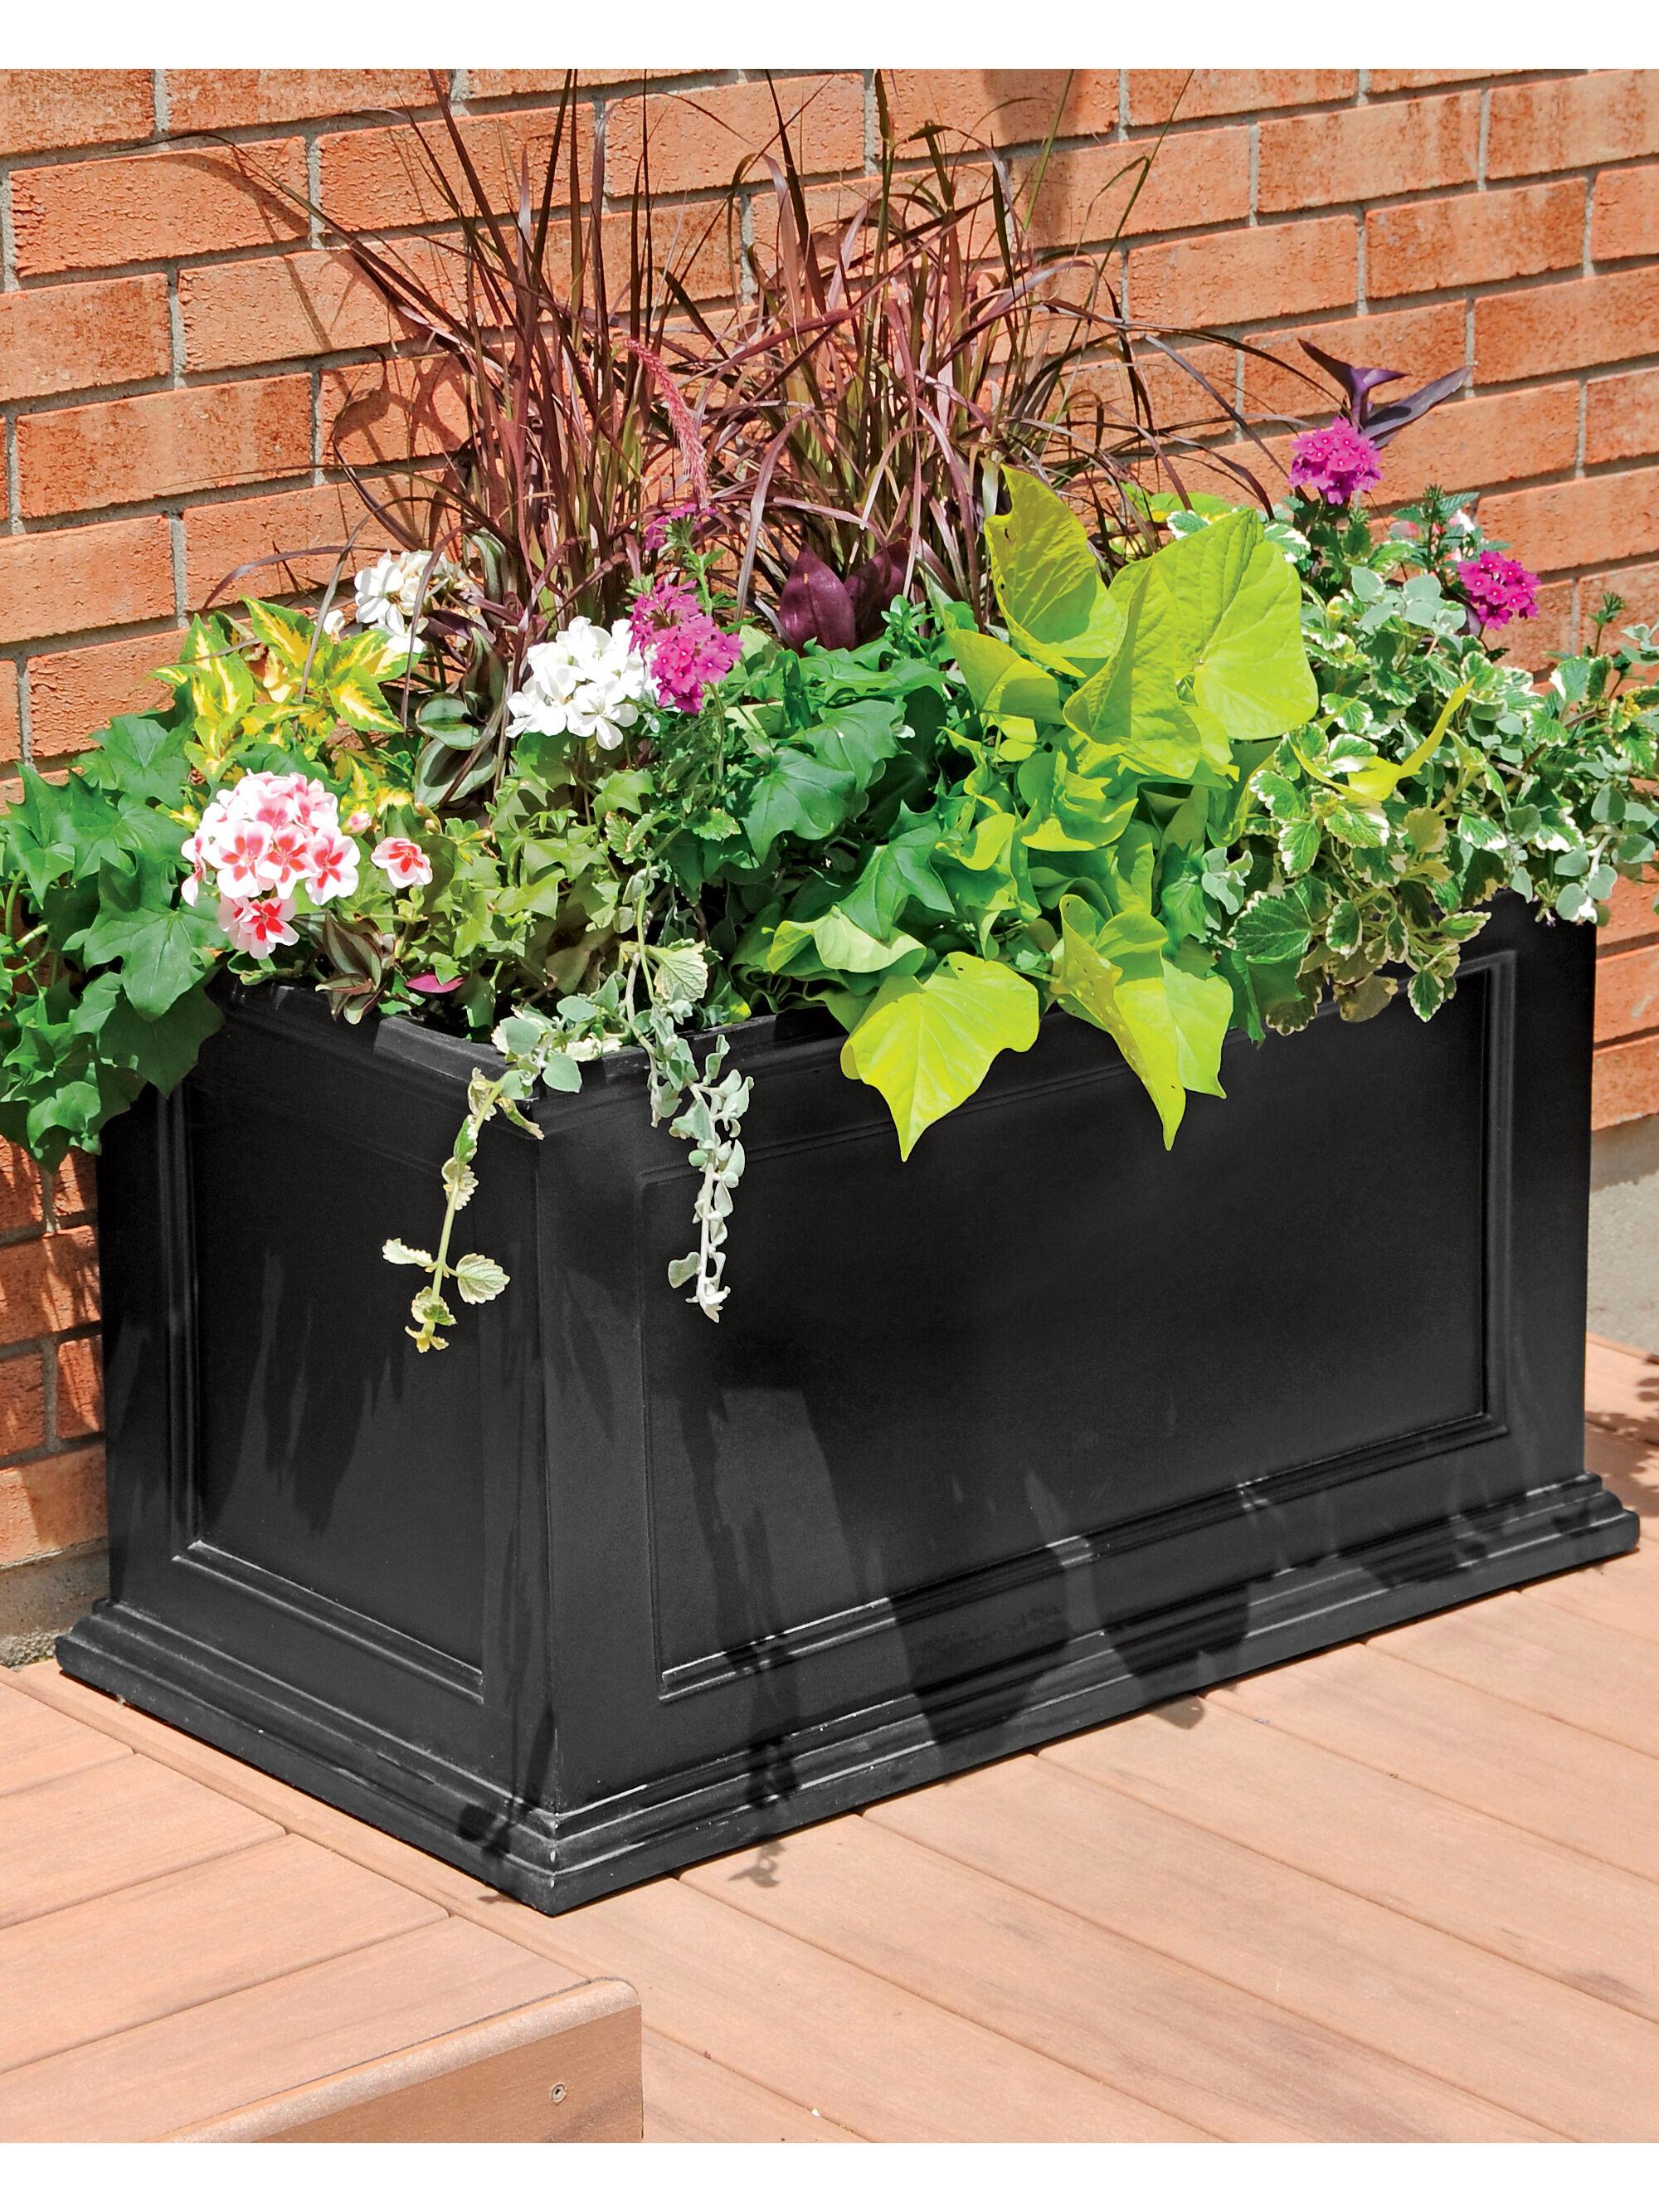 Rolling Elevated Planter Box UGarden Raised Planter  Gardenerscom